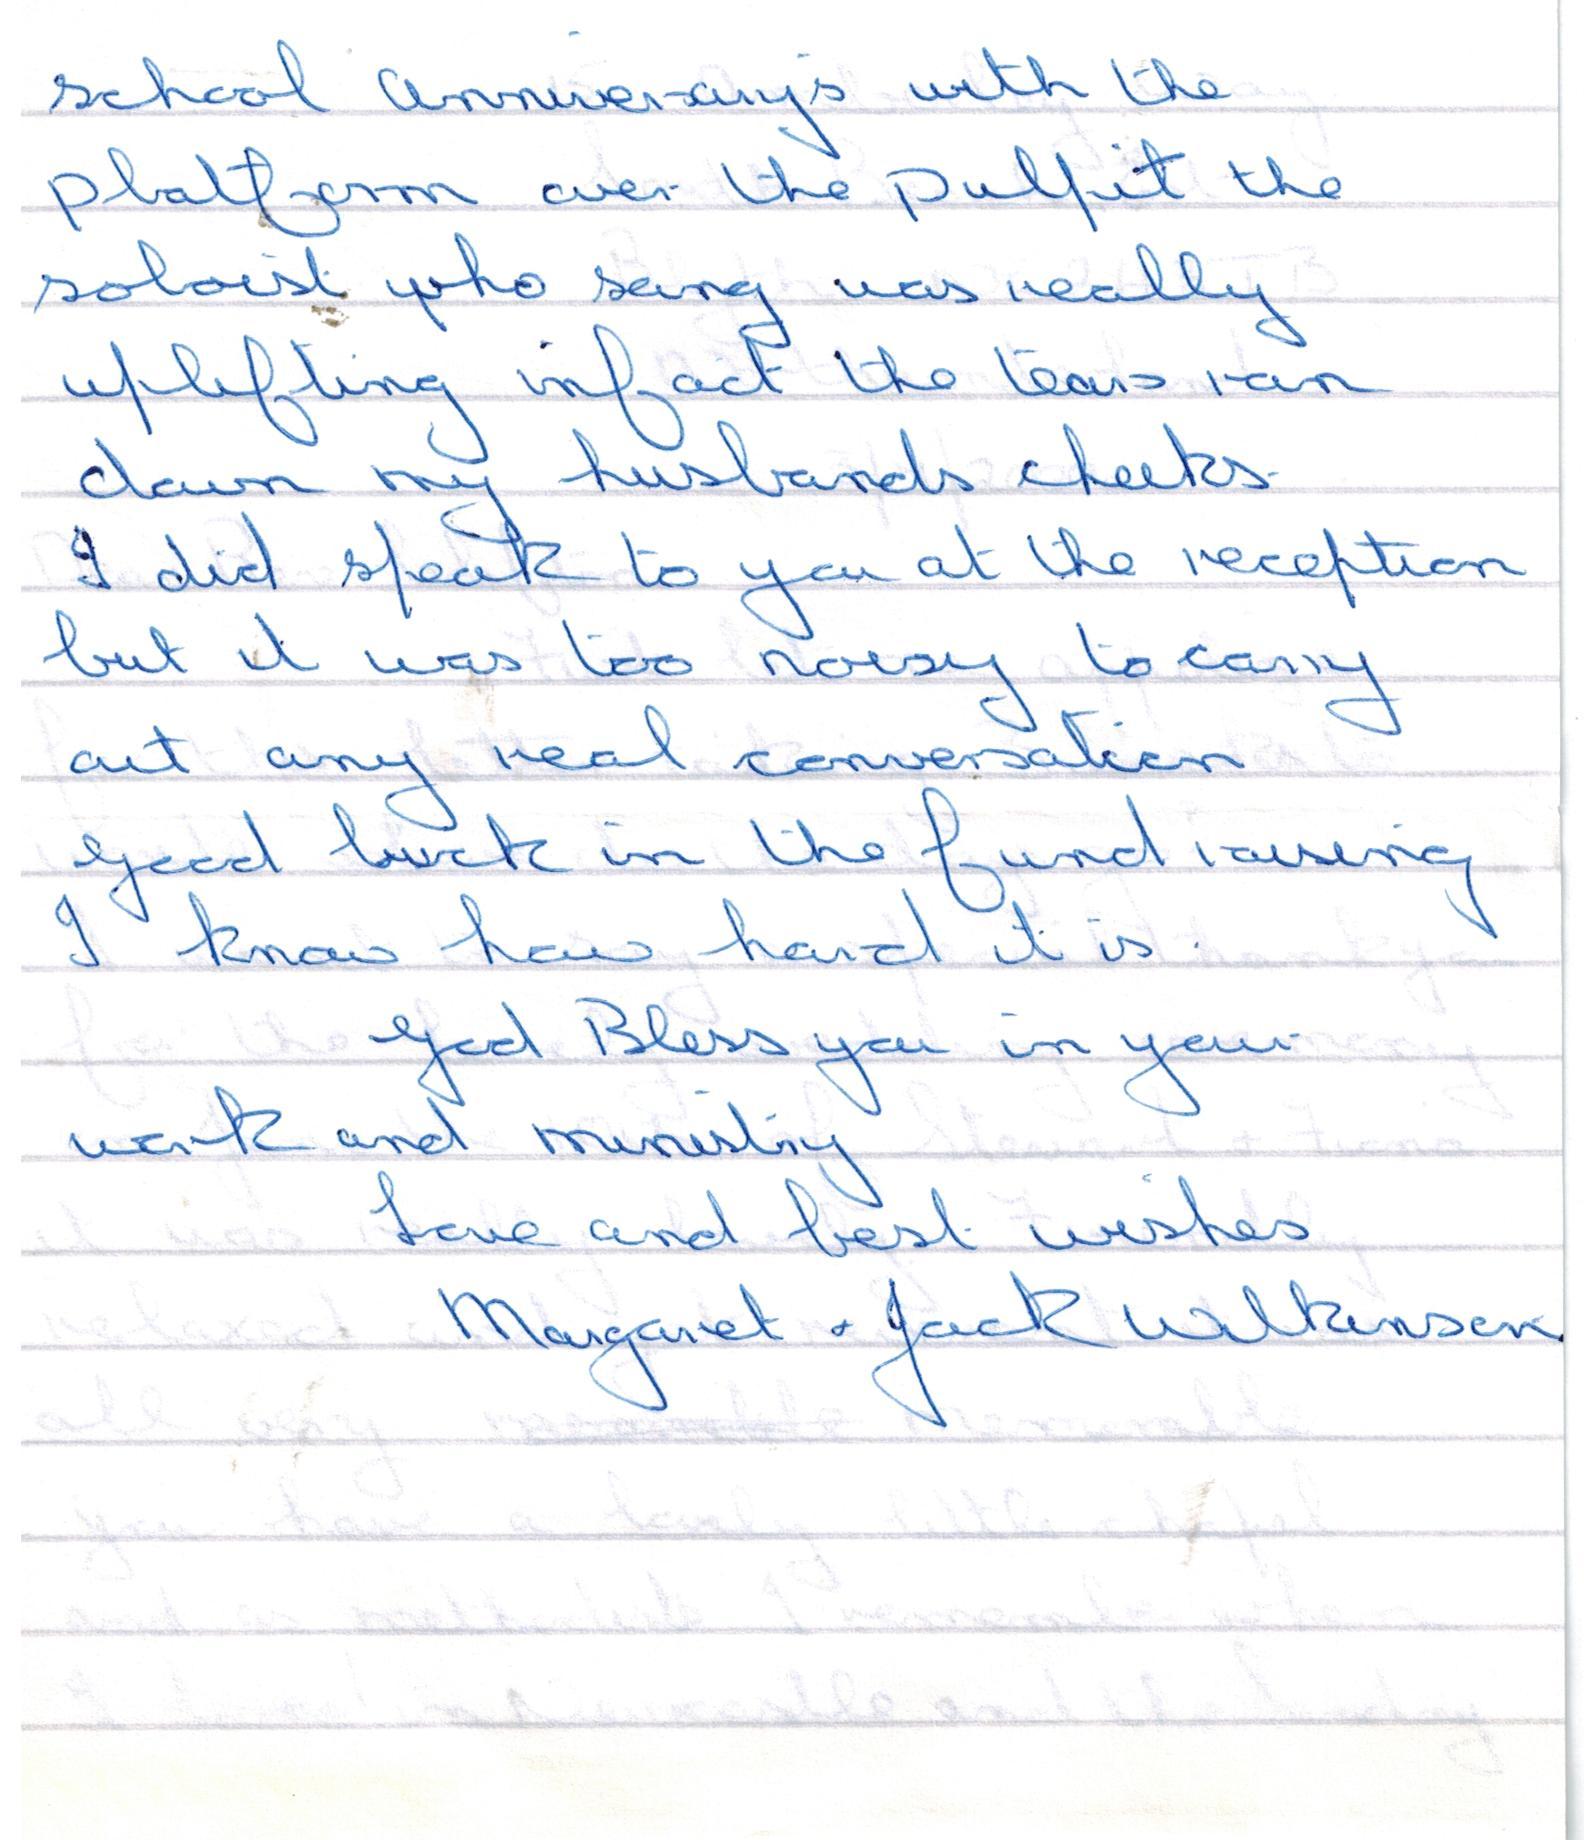 Q025b_Letter_[Margaret-and-Jack_Wilkinson]